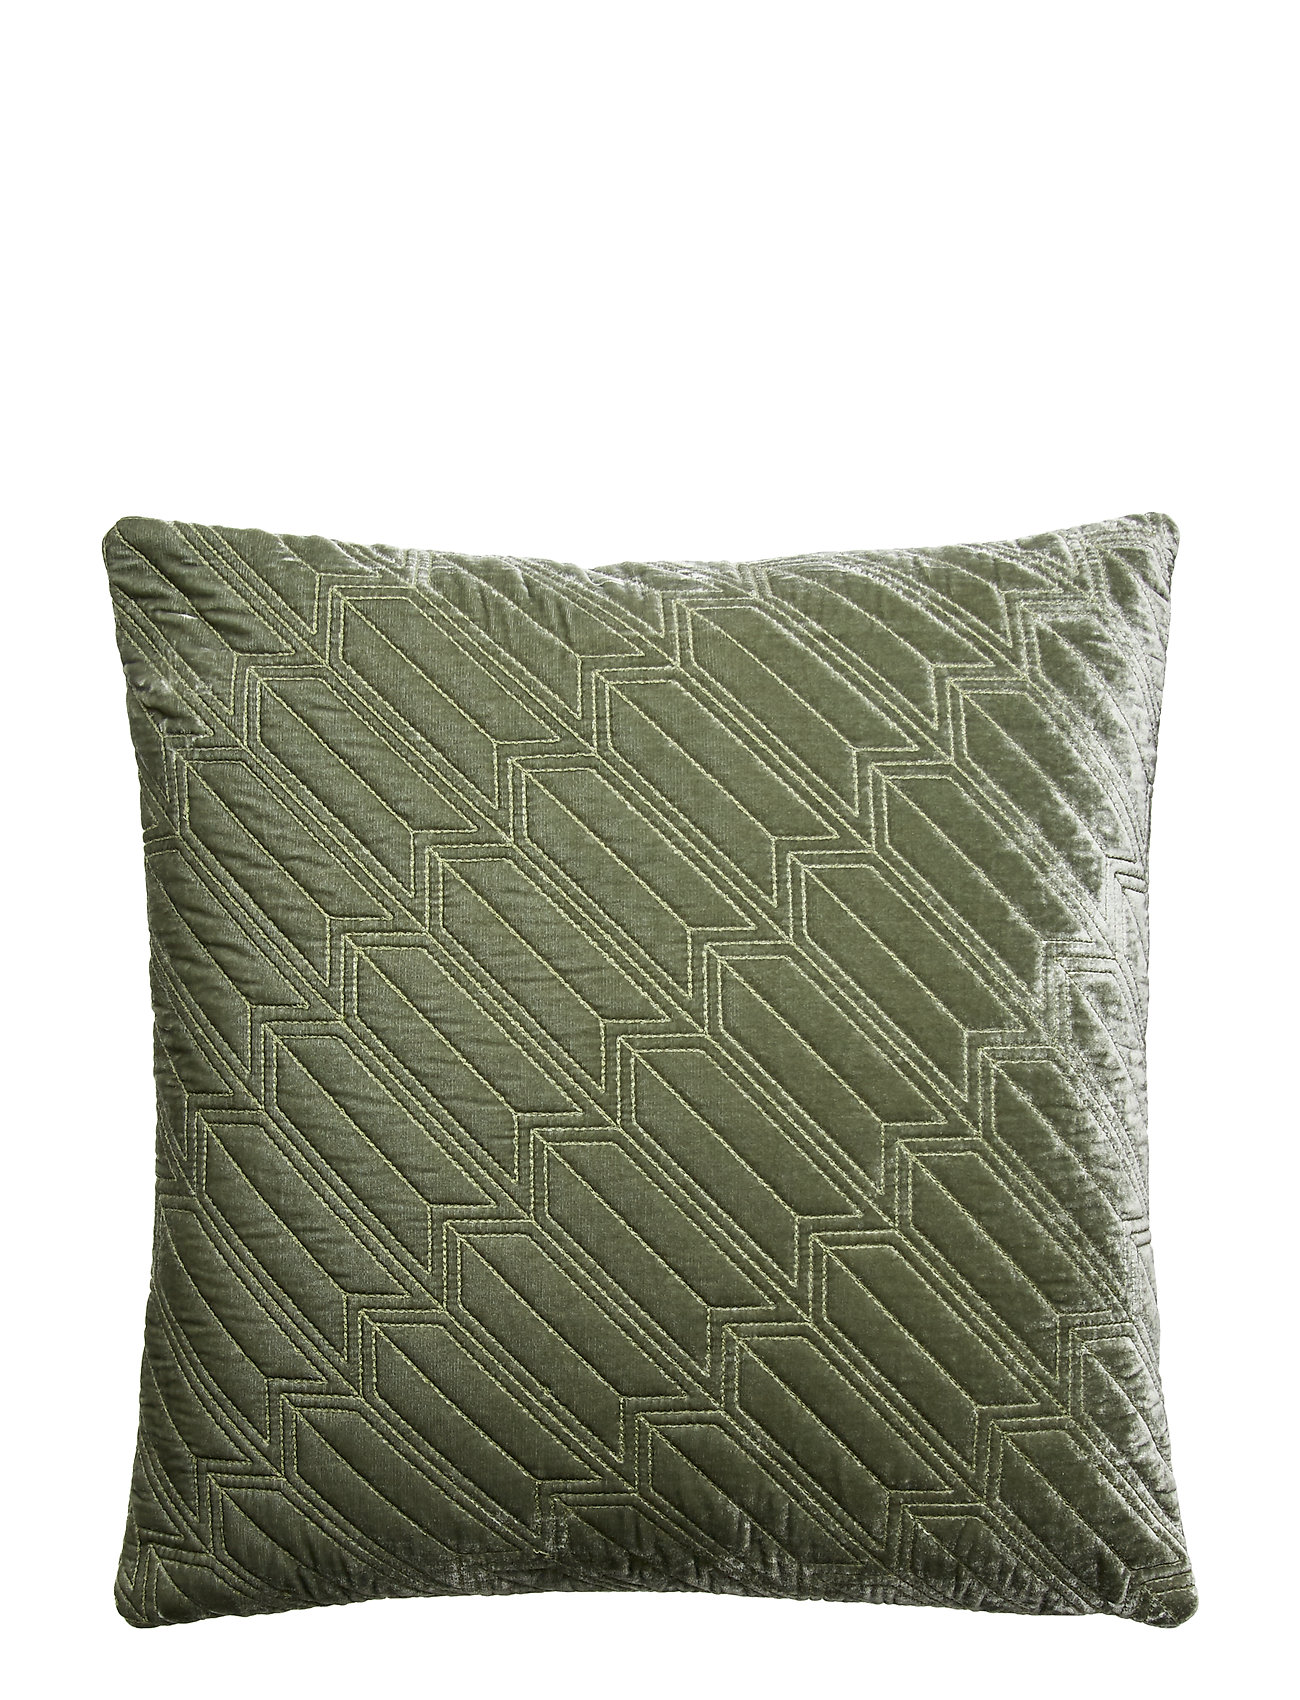 Dirty Linen Arrow decorative cushion - GREEN SHADE